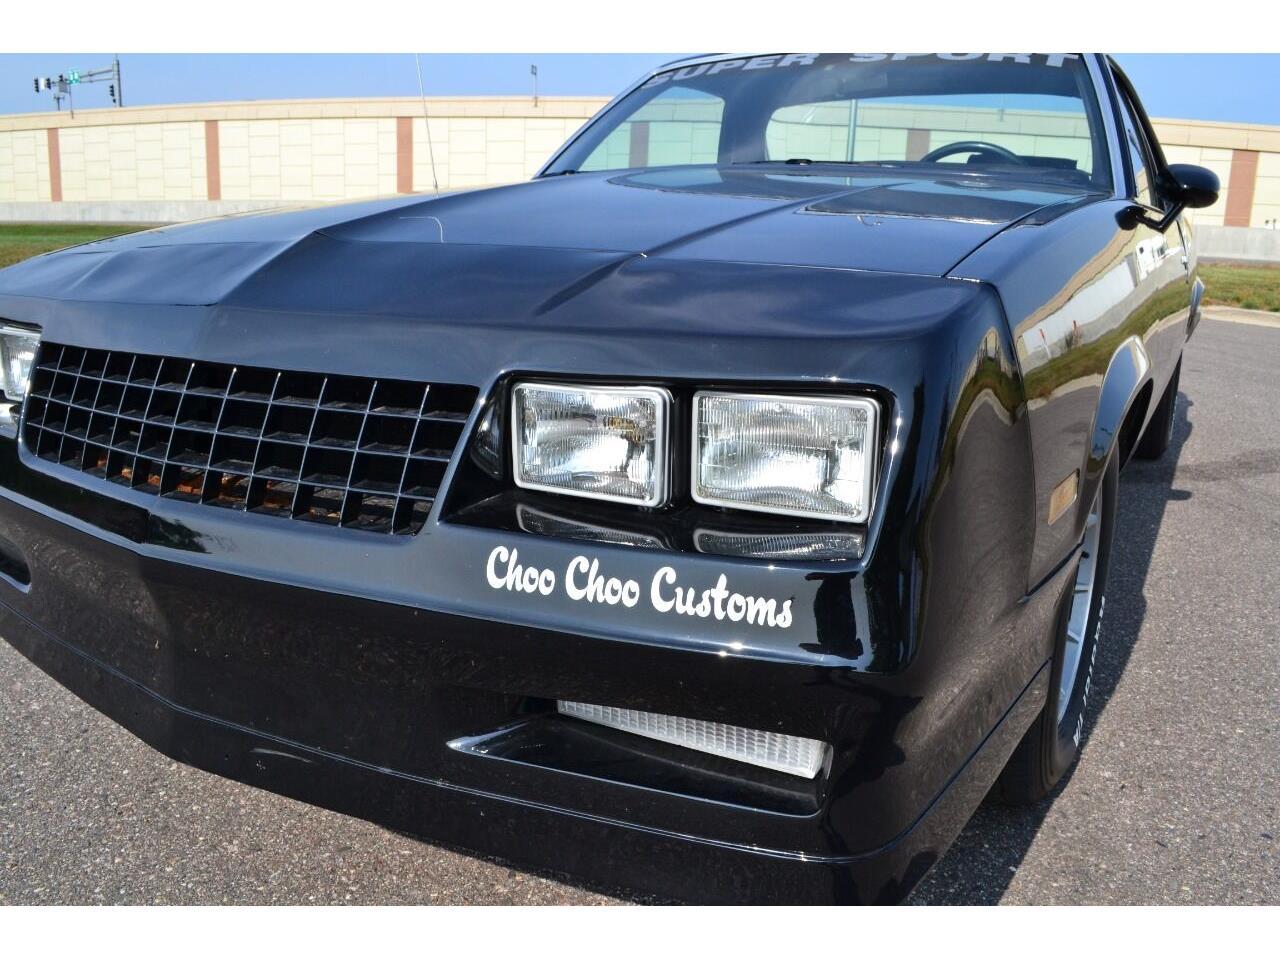 1985 Chevrolet El Camino (CC-1393507) for sale in Ramsey, Minnesota